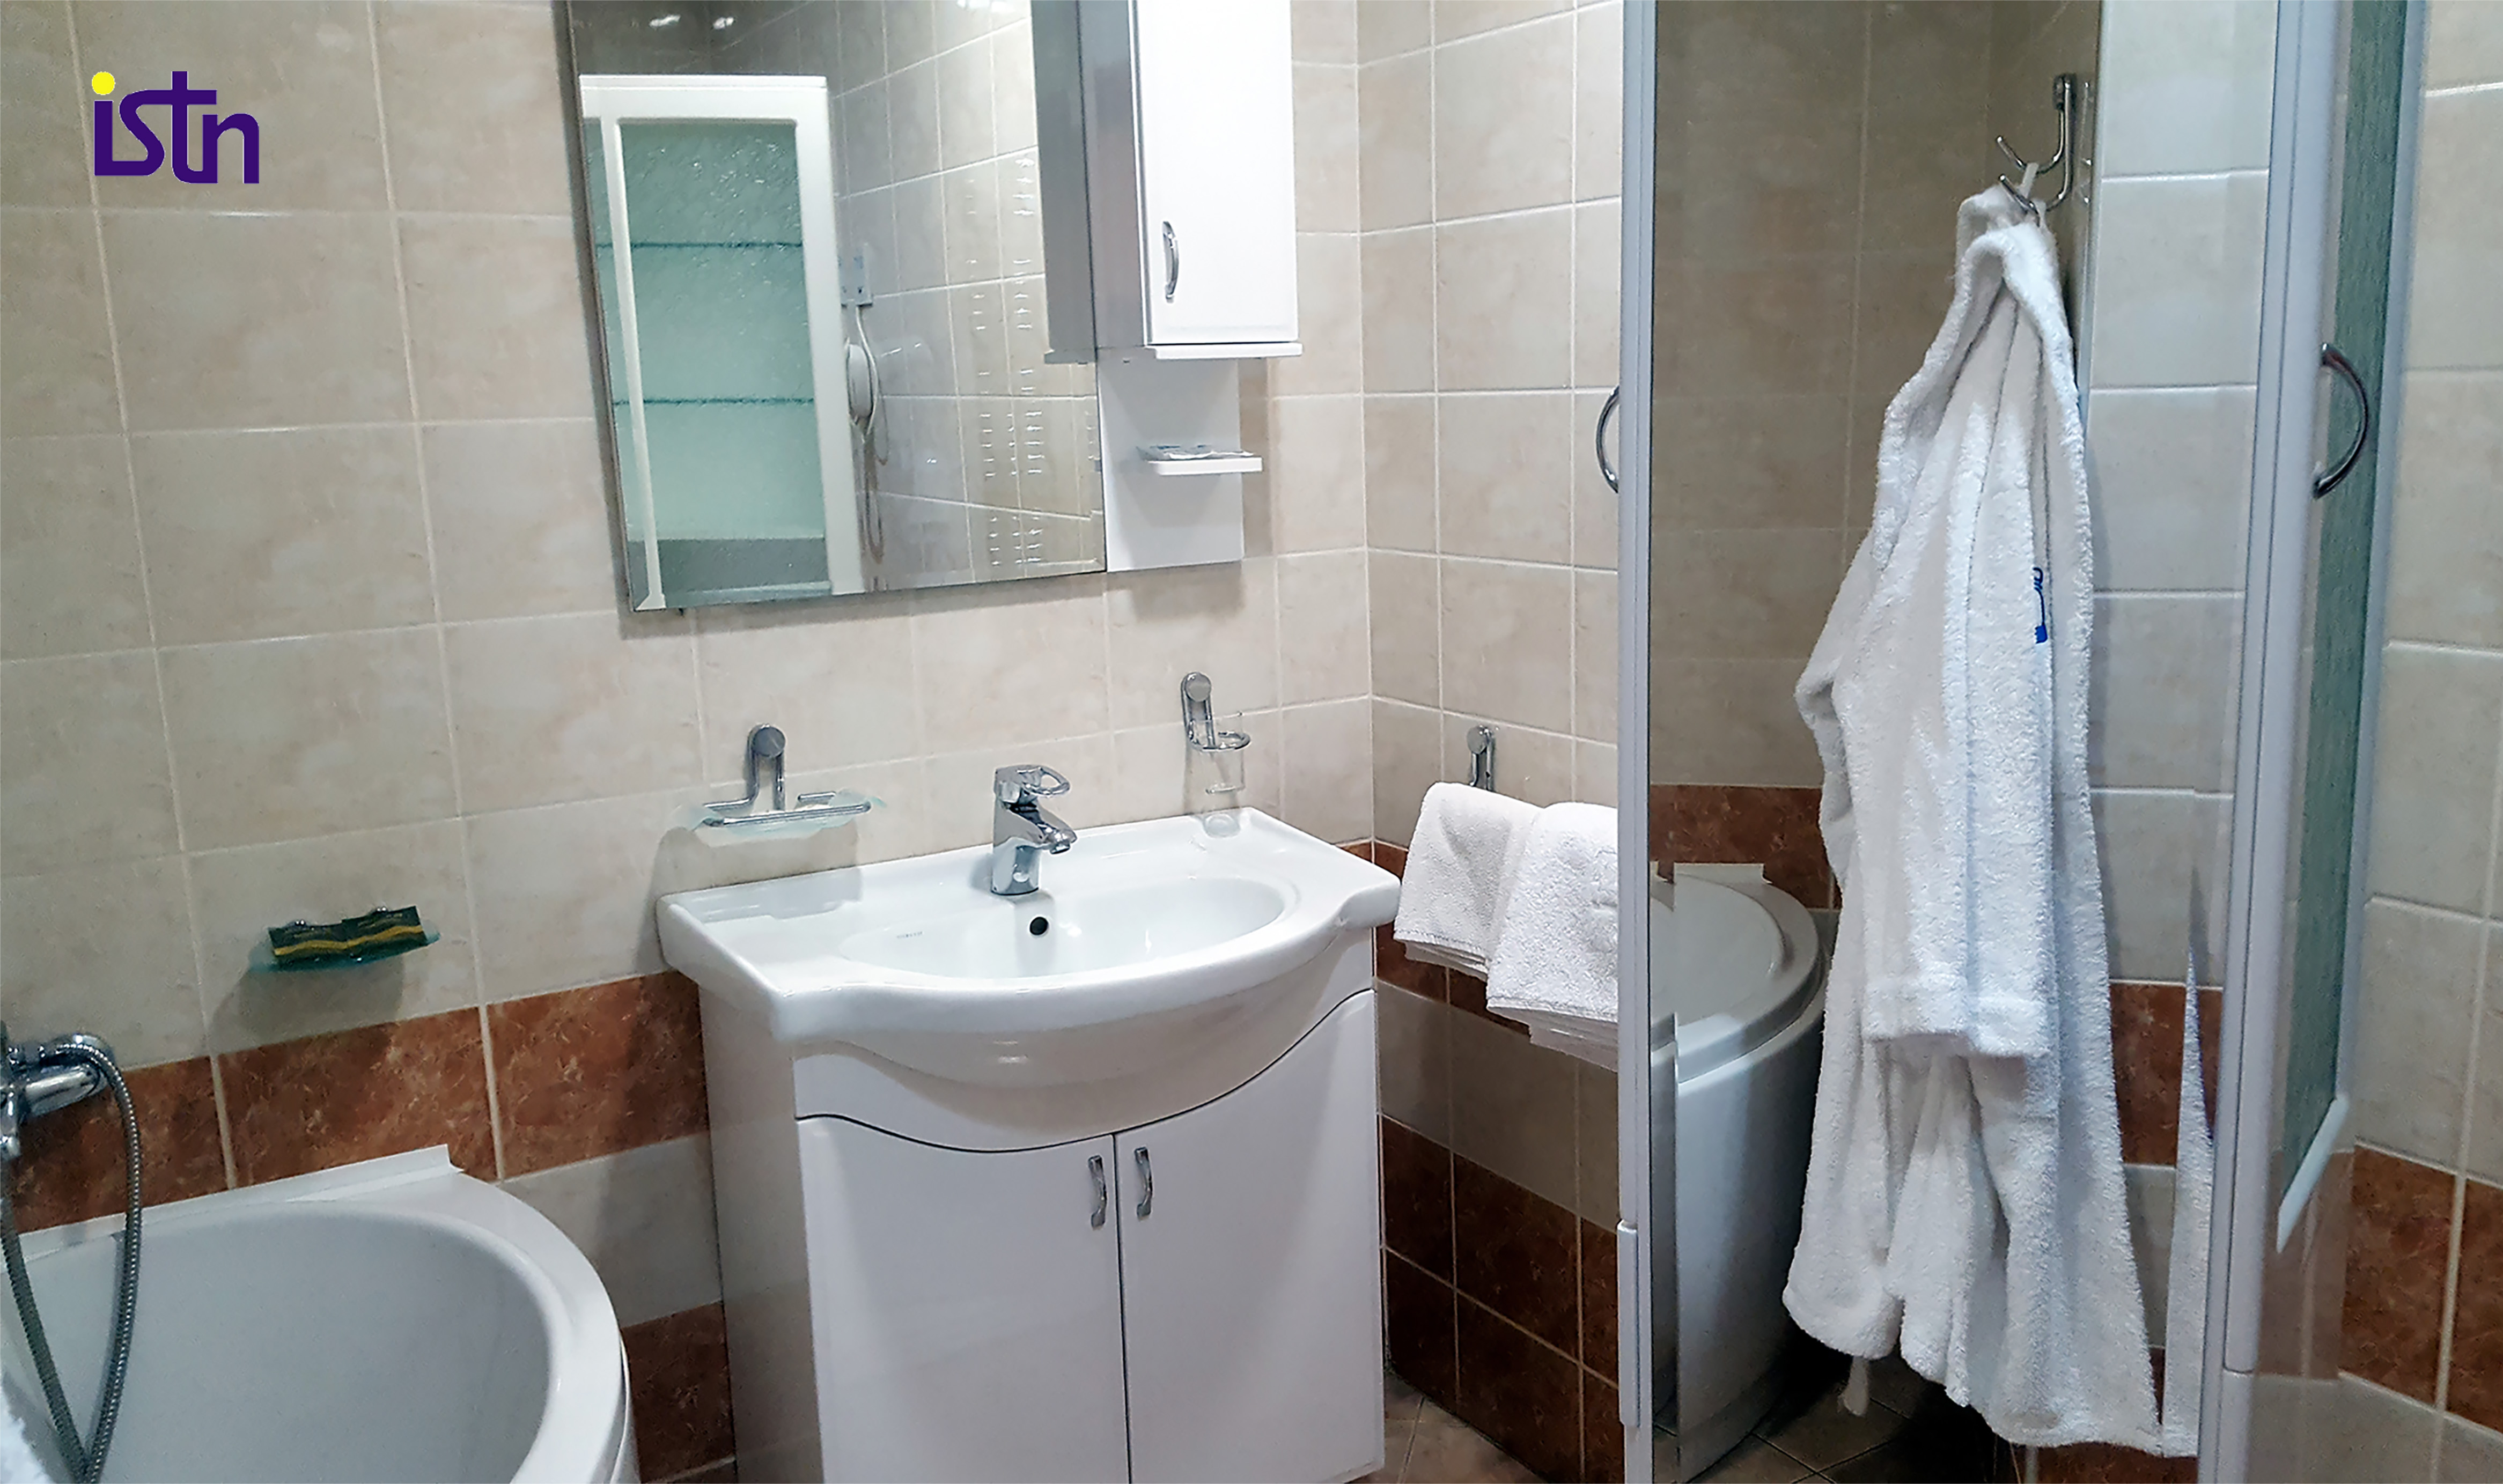 Kanjiza, hotel Aquamarin, ISTN